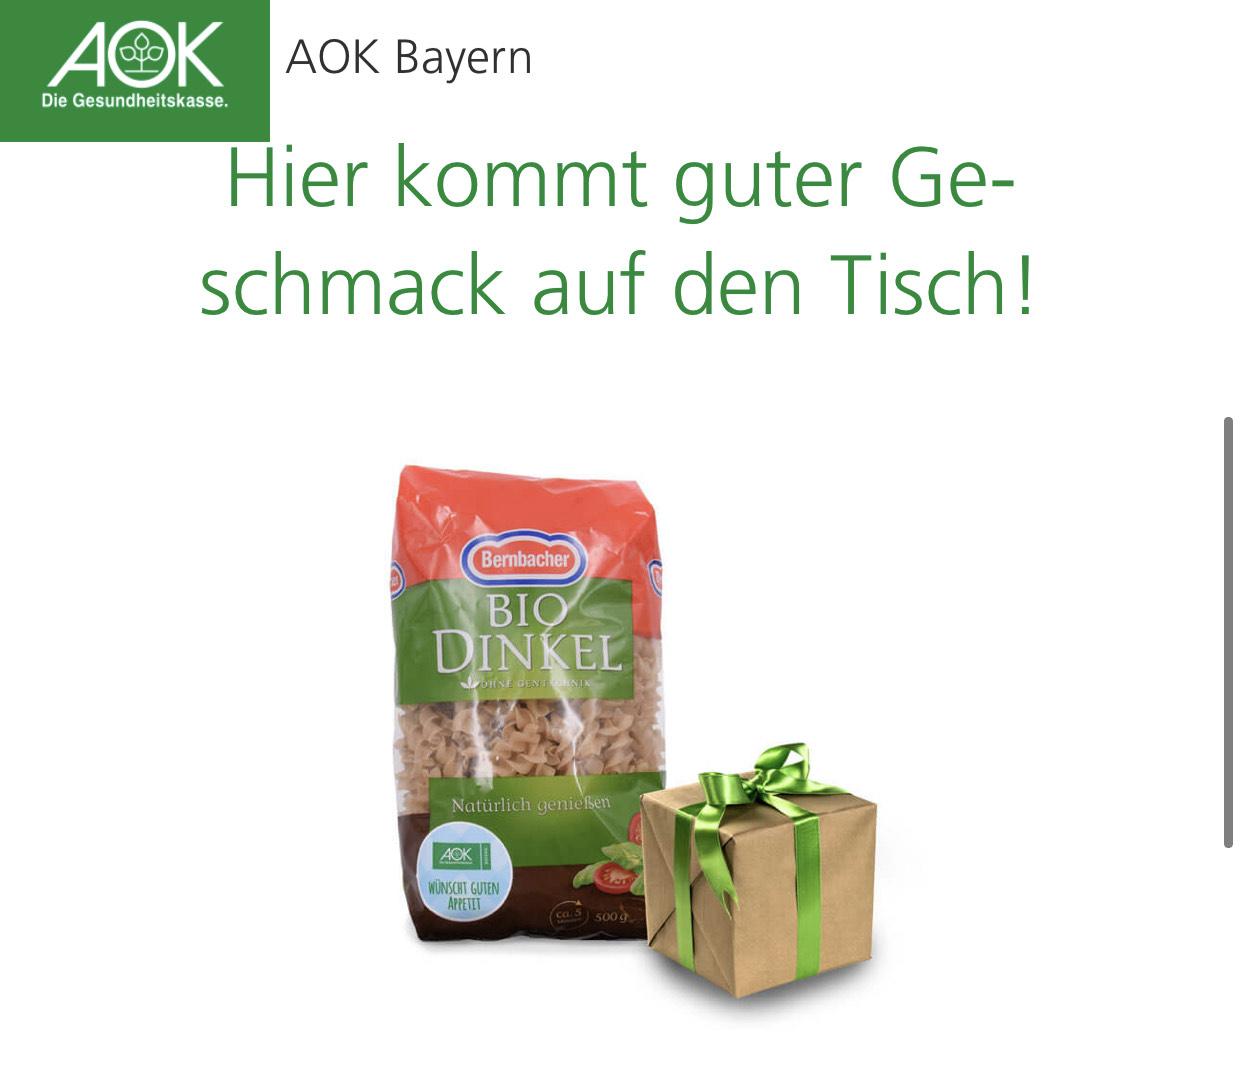 Lokal: Bayern: AOK - Gratis Bio Dinkel Nudeln oder gesunde Überraschung